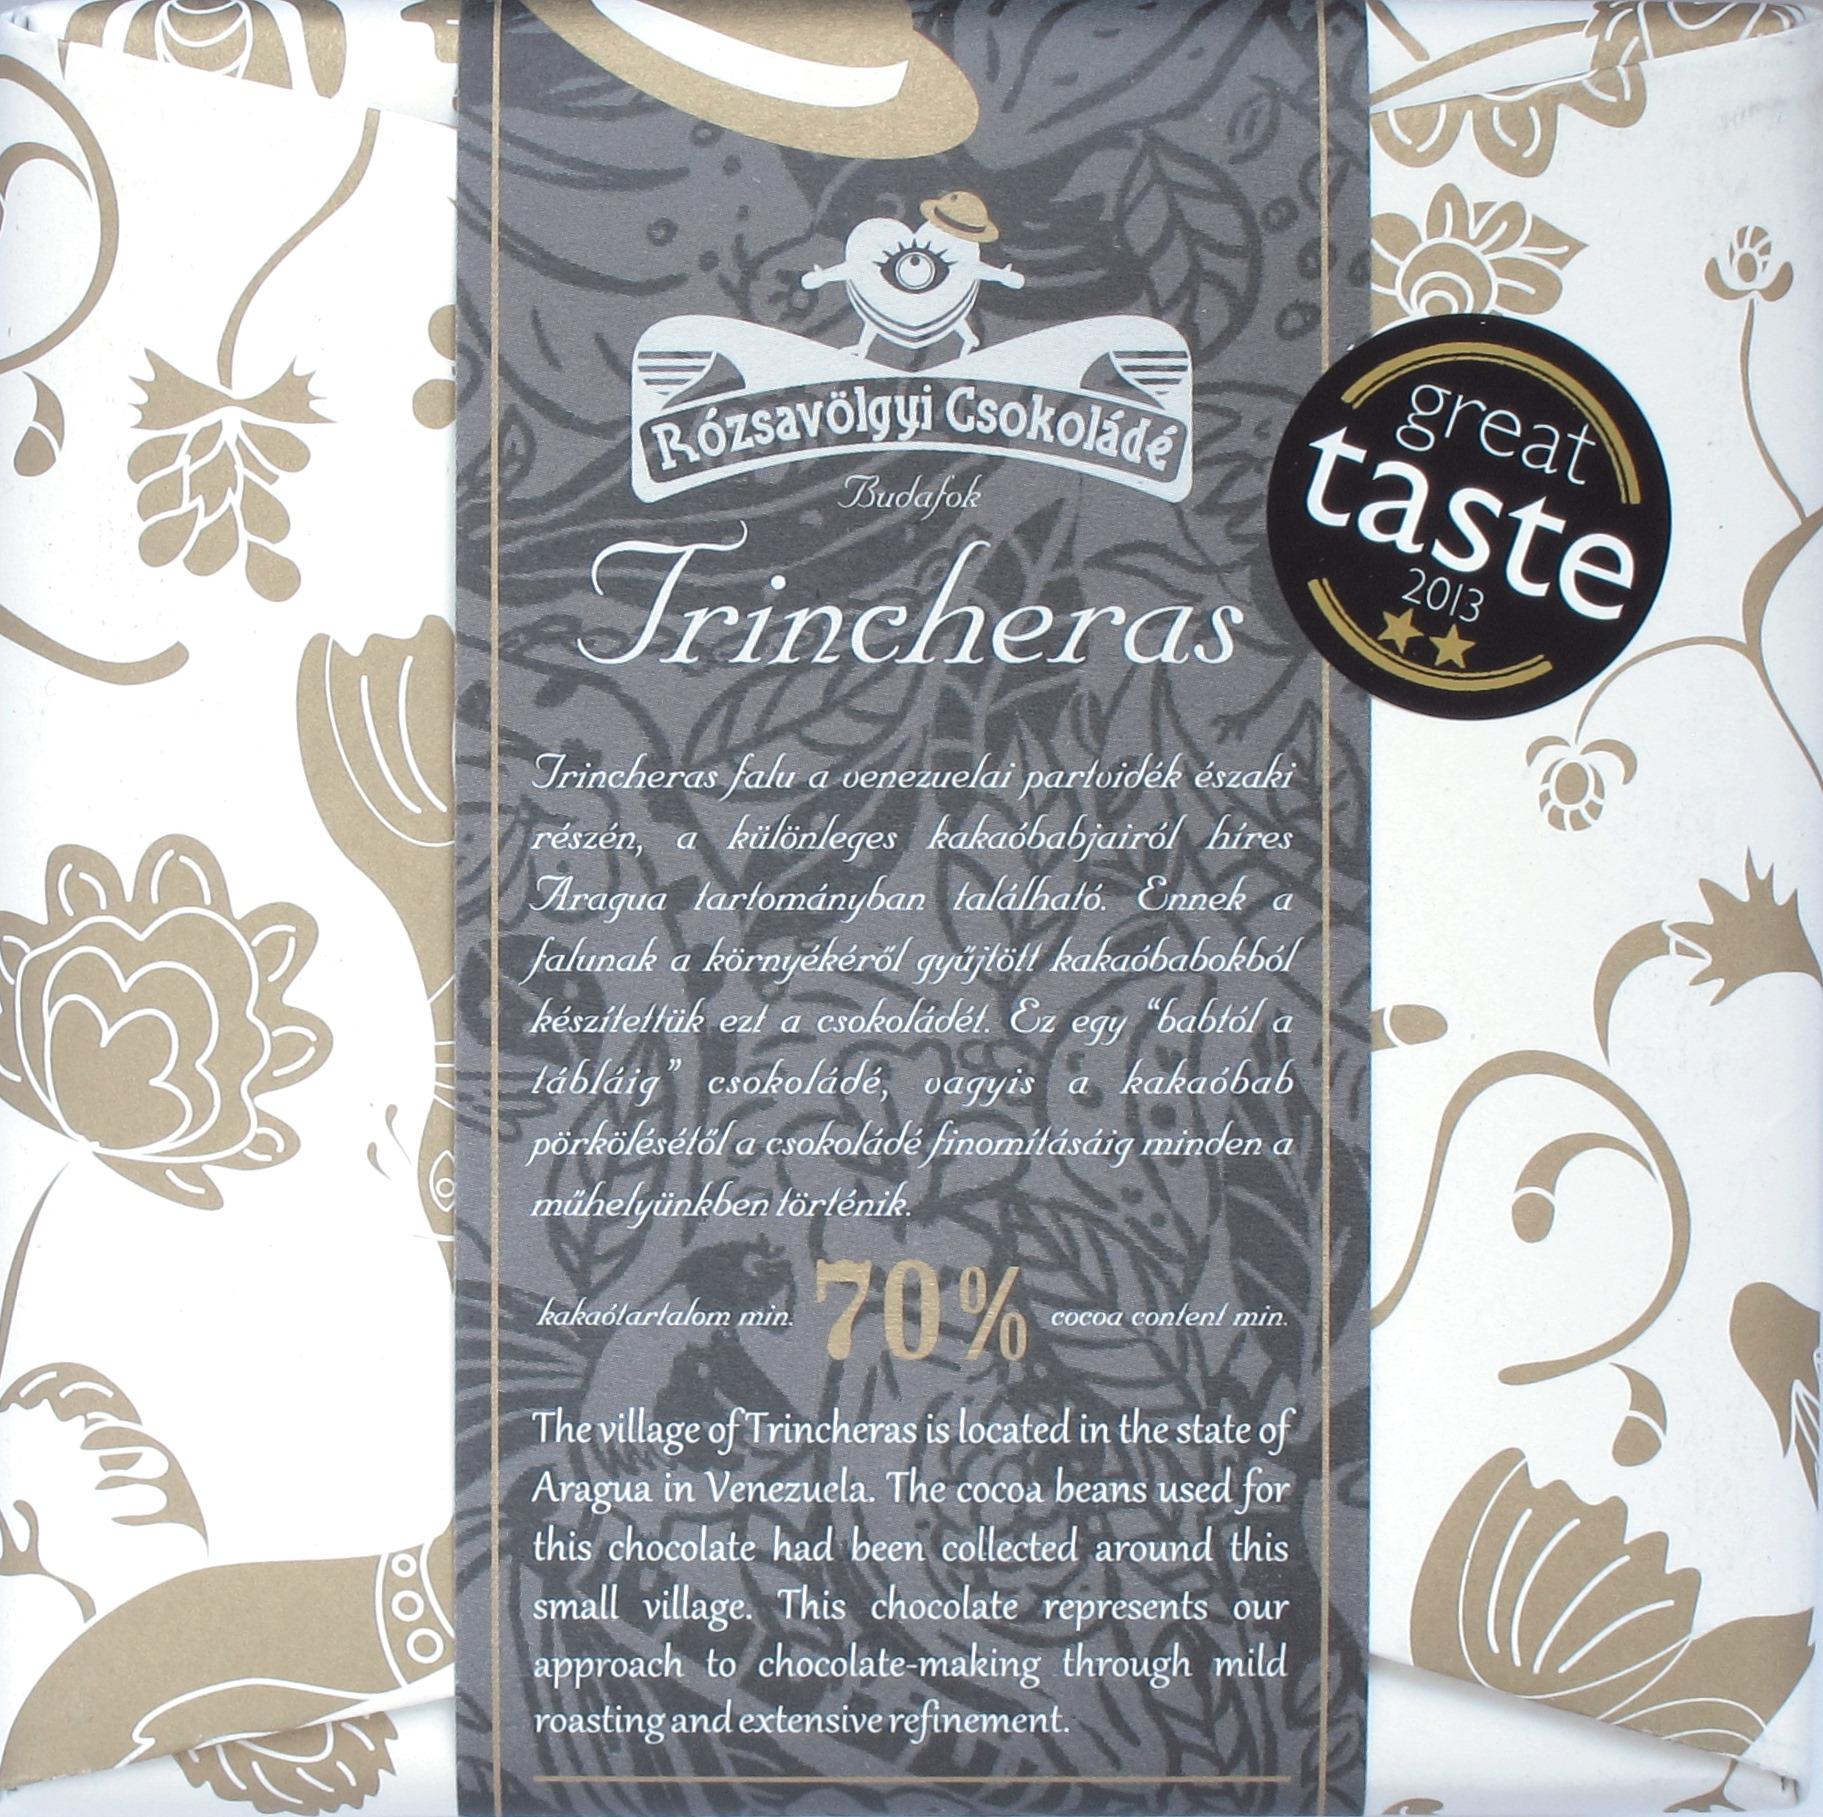 Rozsavolgyi Csokolade Trincheras 70%